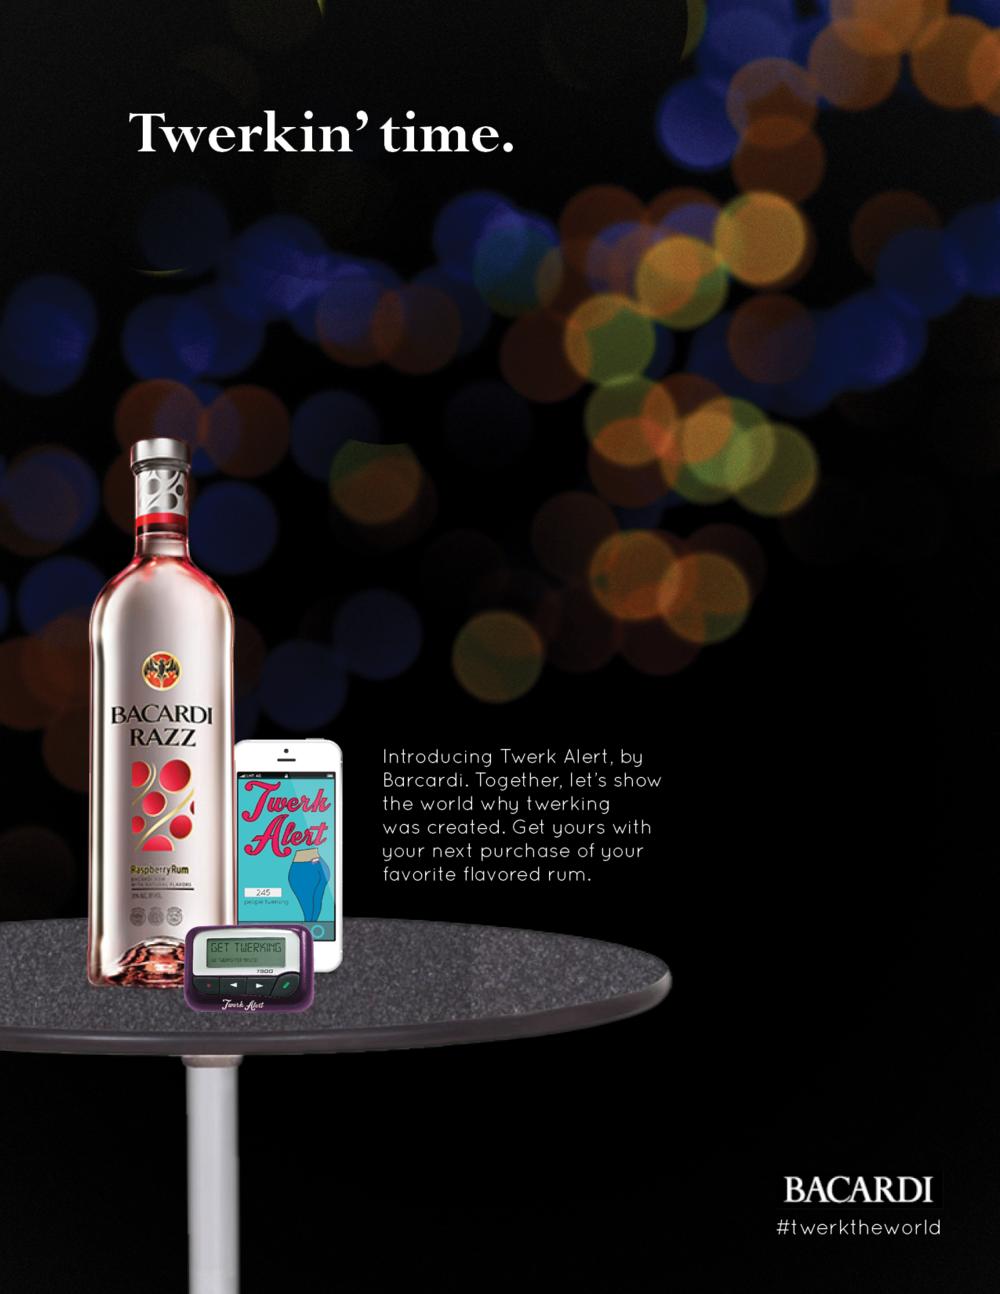 Print ad for the Twerk Alert Device